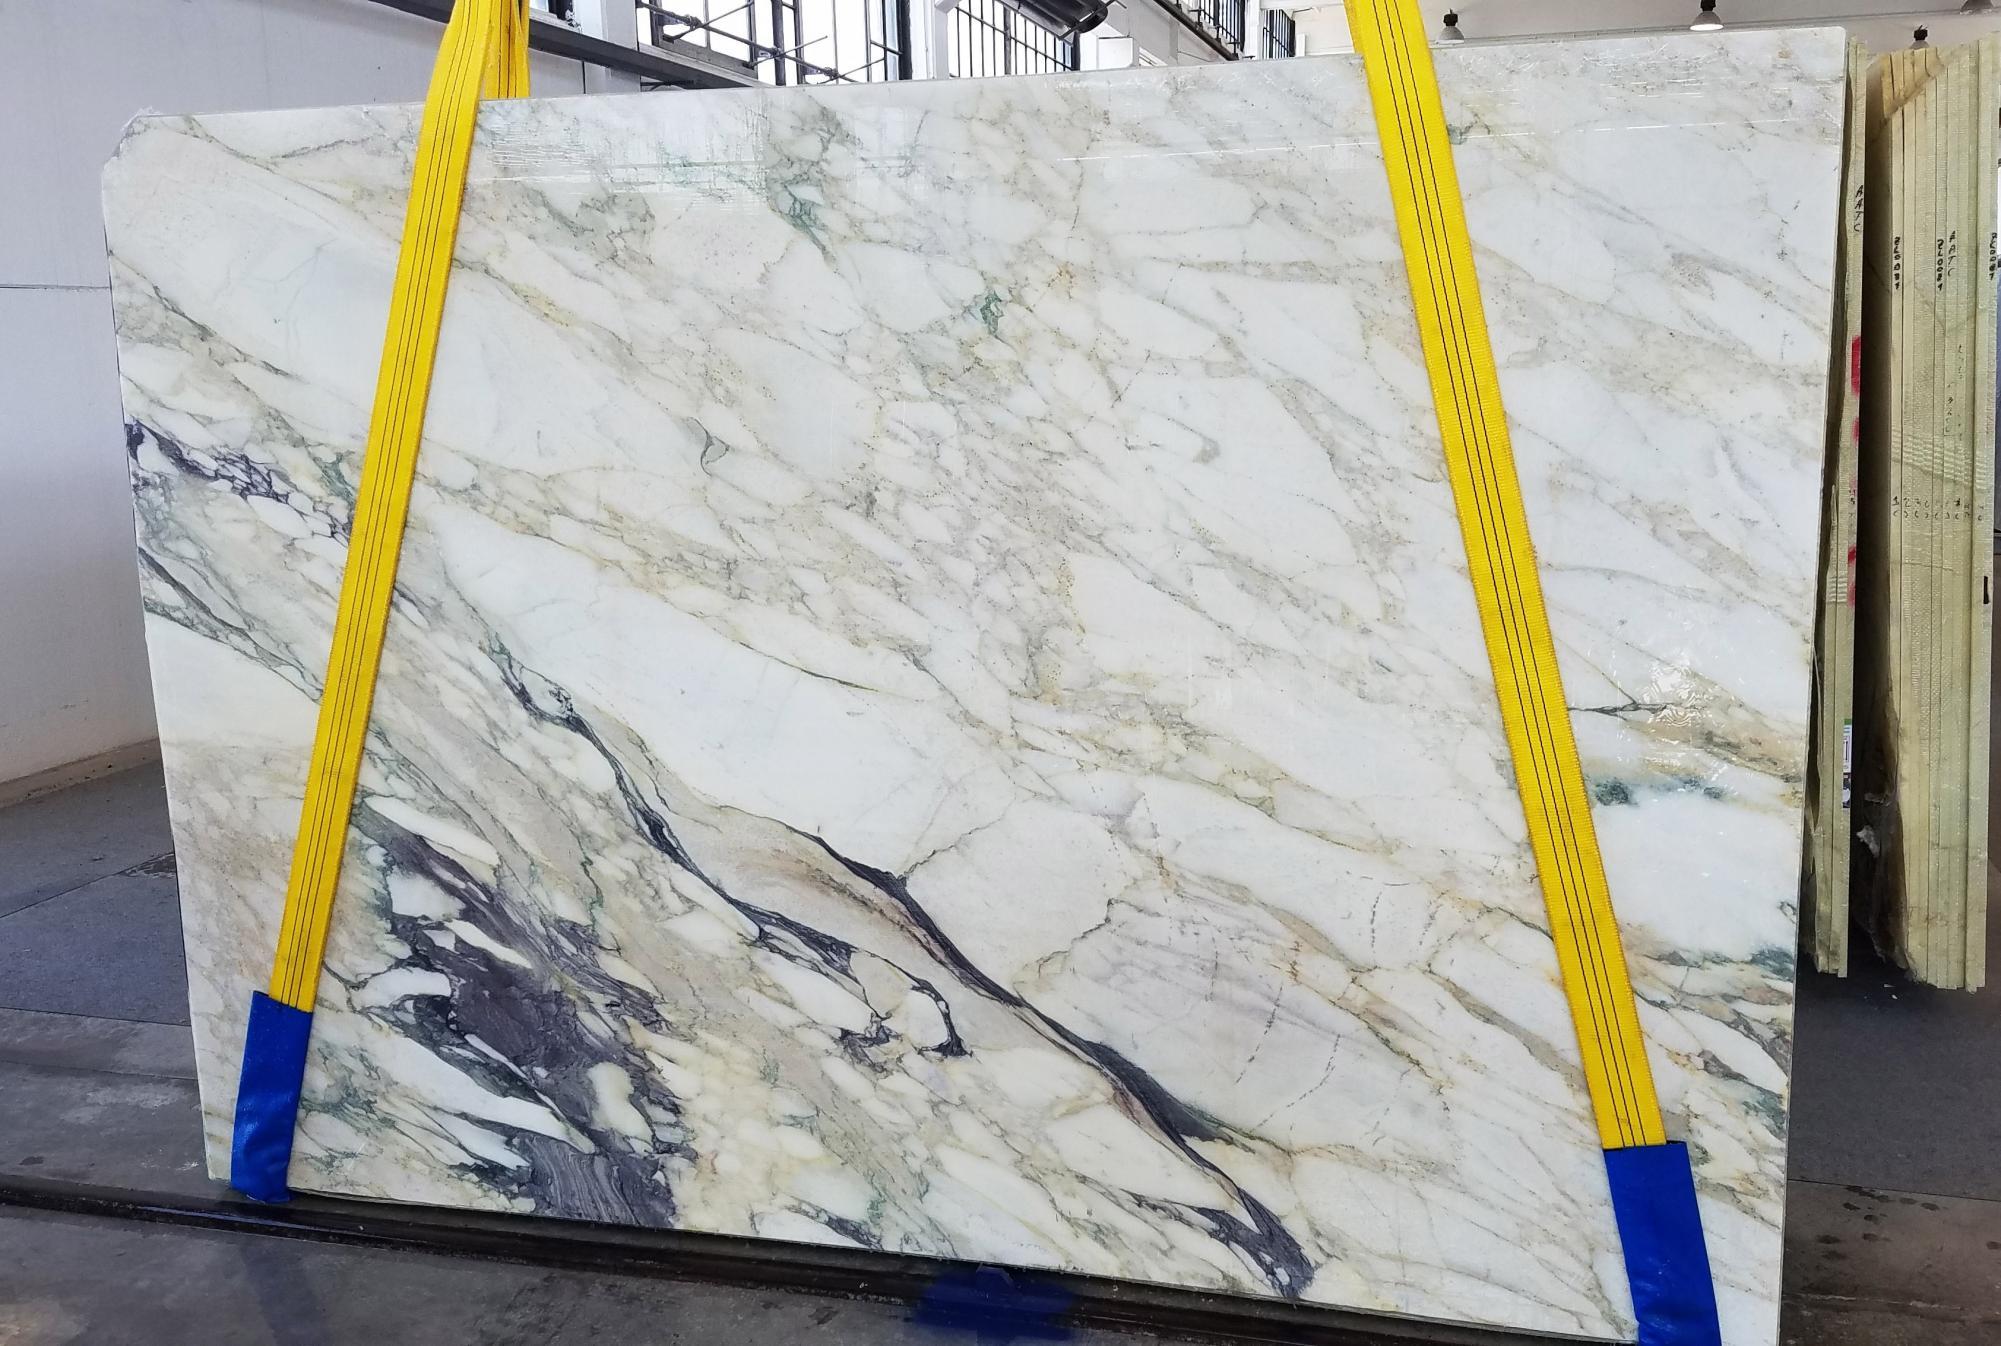 CALACATTA FIORITO Supply Veneto (Italy) sawn slabs U0433 , Slab #34 natural marble